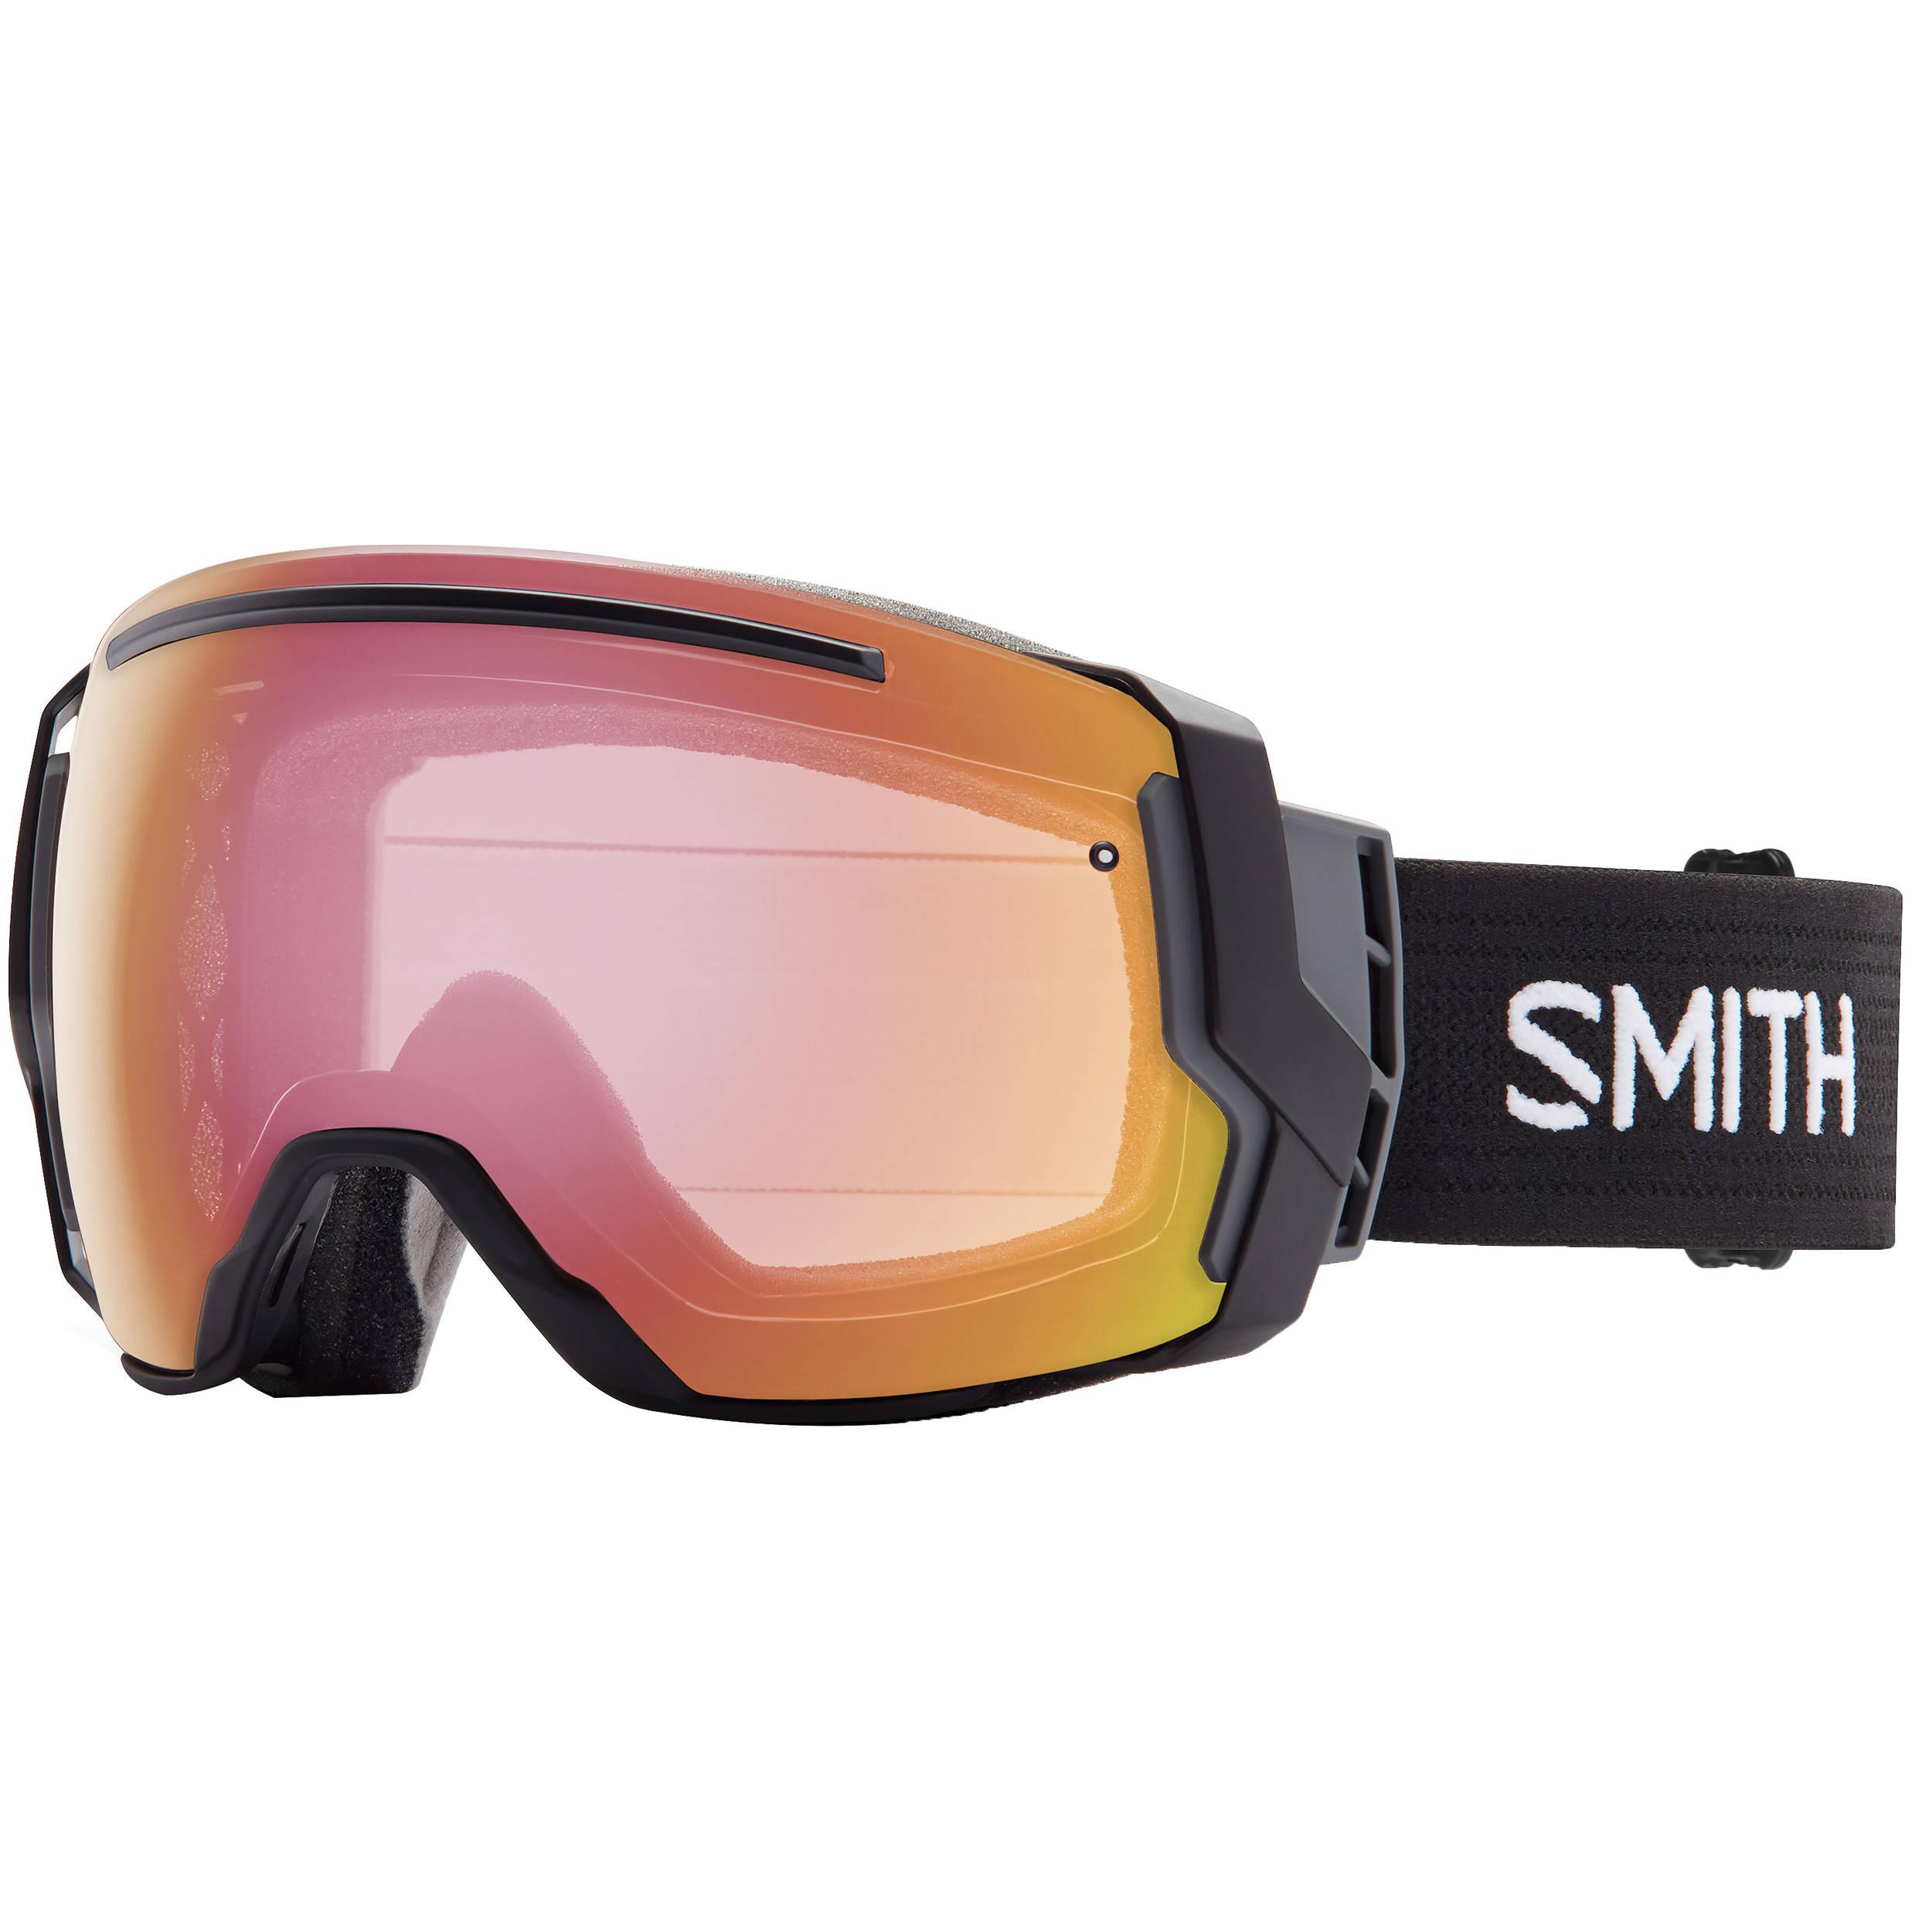 cafb1eeae196 Smith Optics I O 7 Snow Goggles IE7PRZBK16 B H Photo Video